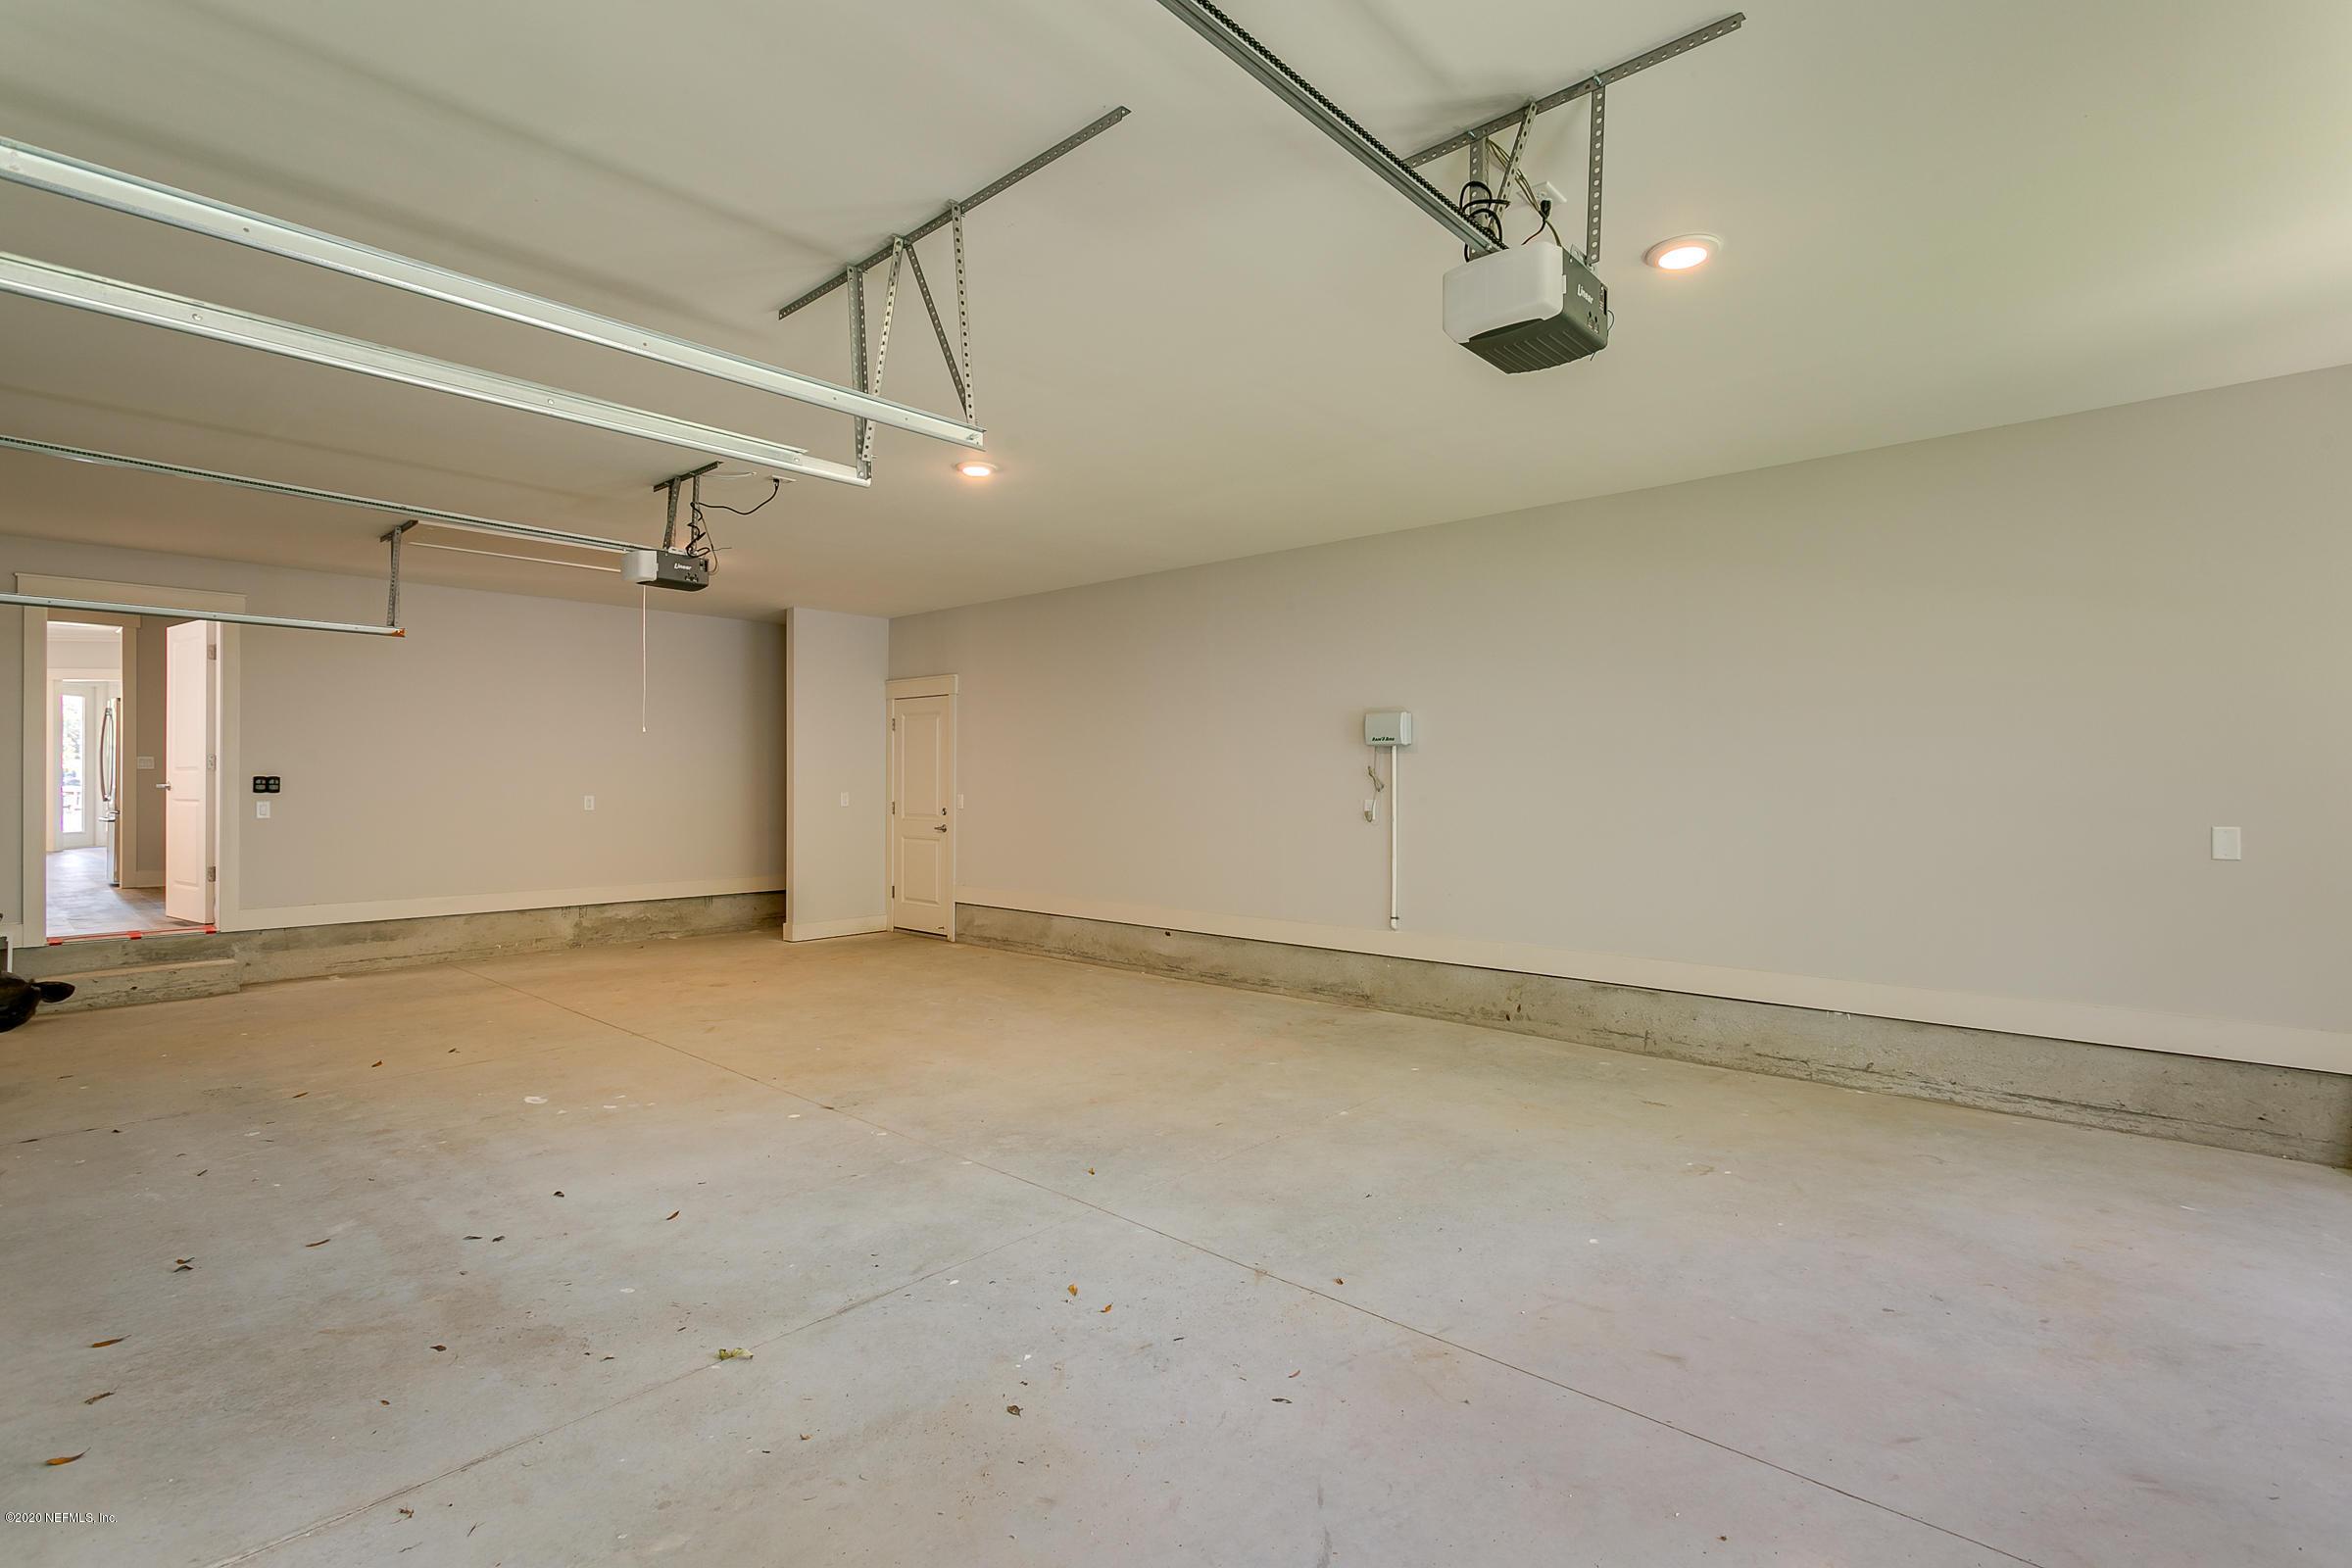 1791 OSPREY LANDING, FLEMING ISLAND, FLORIDA 32003, 4 Bedrooms Bedrooms, ,3 BathroomsBathrooms,Residential,For sale,OSPREY LANDING,1015798